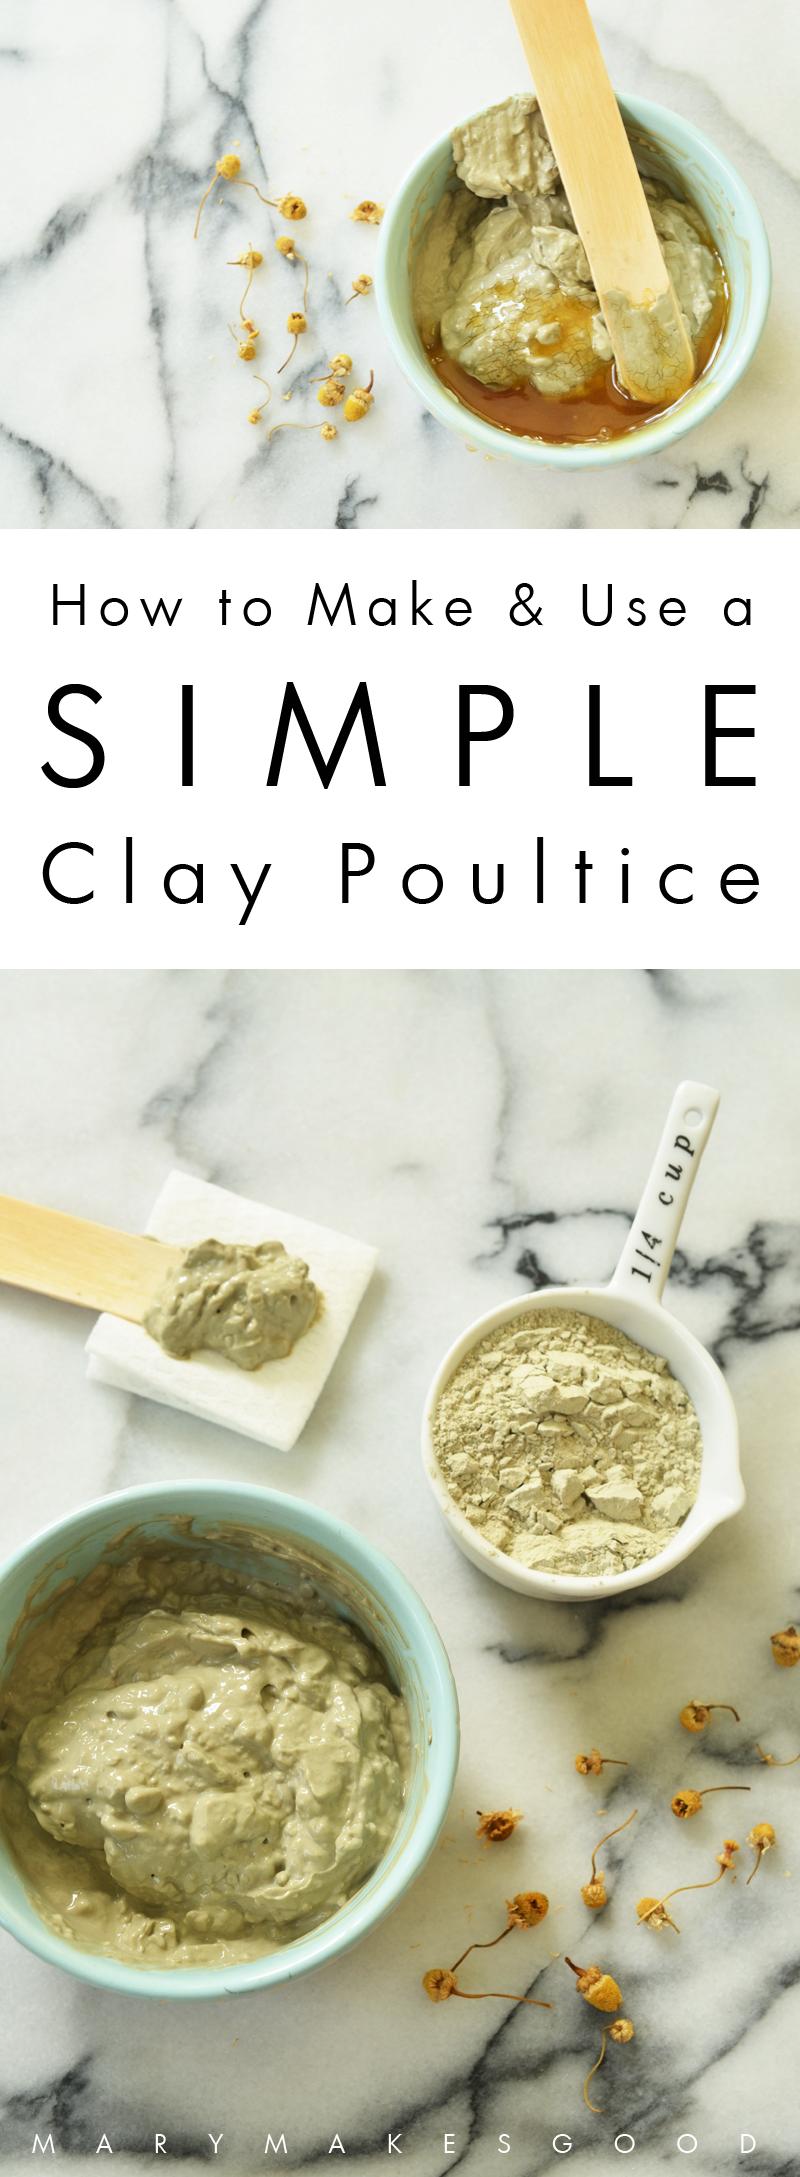 Clay Poultice Recipe